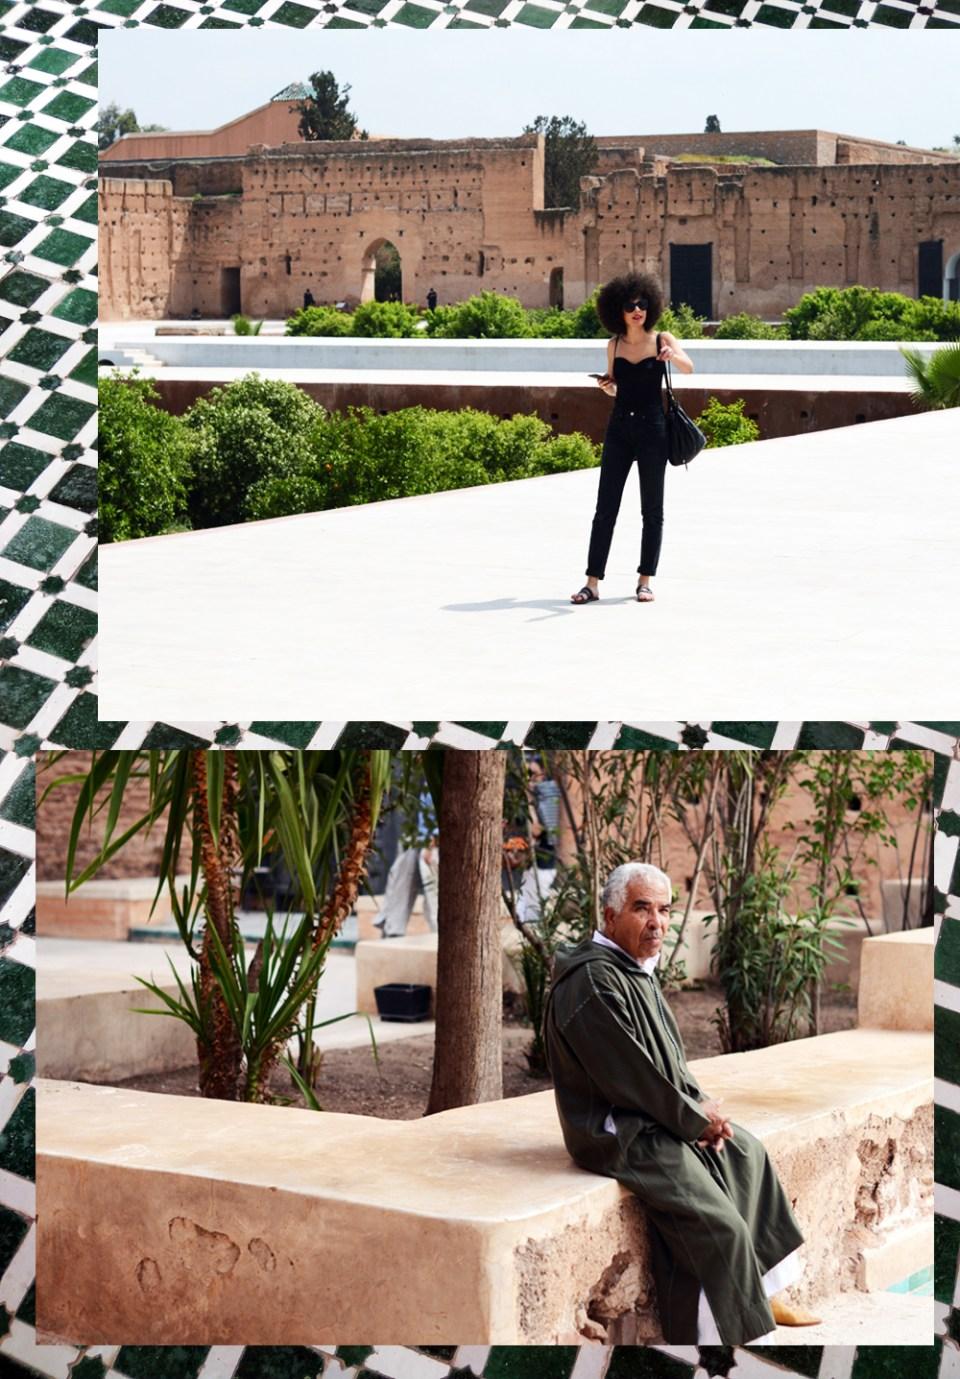 24-mercredie-blog-mode-geneve-suisse-blogueuse-bloggeuse-geneva-swiss-maroc-marocco-trip-marrakech-marrakesh-visite-trip-palais-el-badi